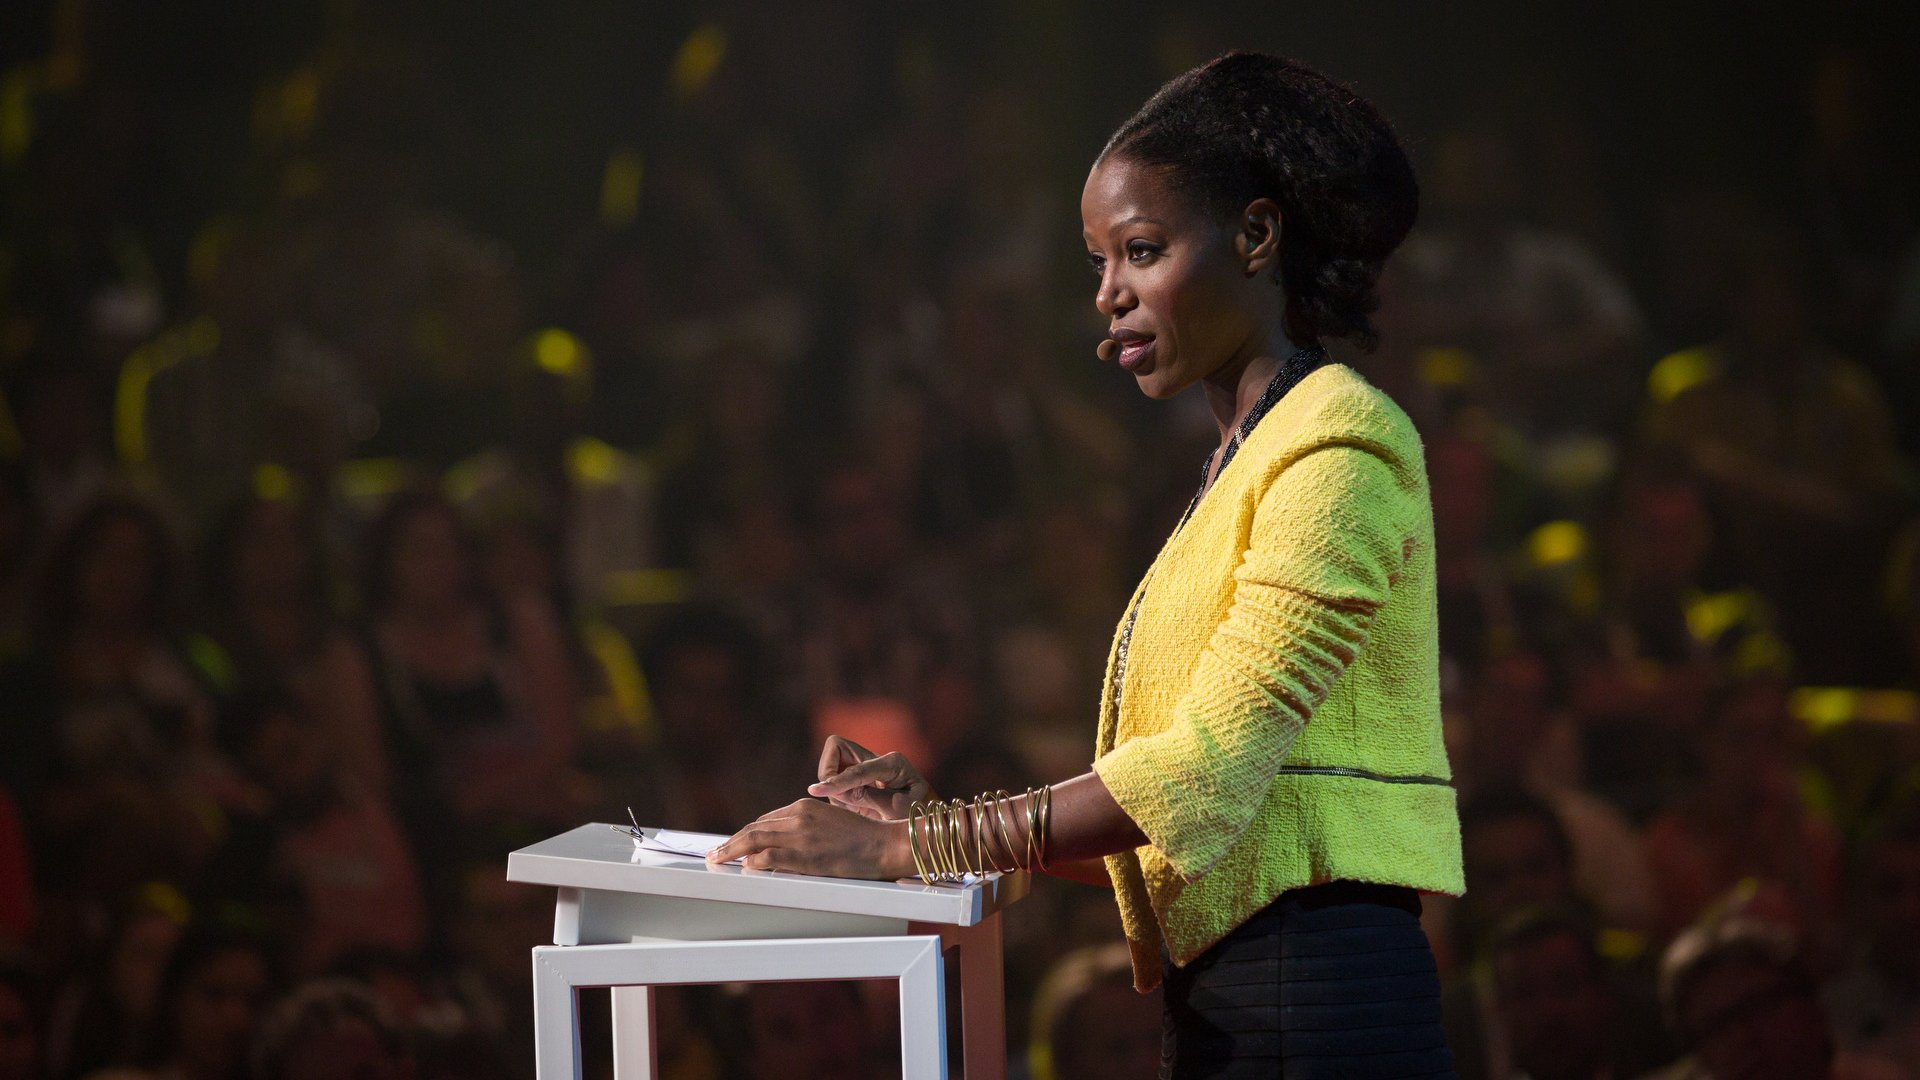 Taiye Selasi speaking at TEDGlobal 2014, South, Session 3 - Crossing Borders, October 5-10, 2014, Rio de Janeiro, Brazil.